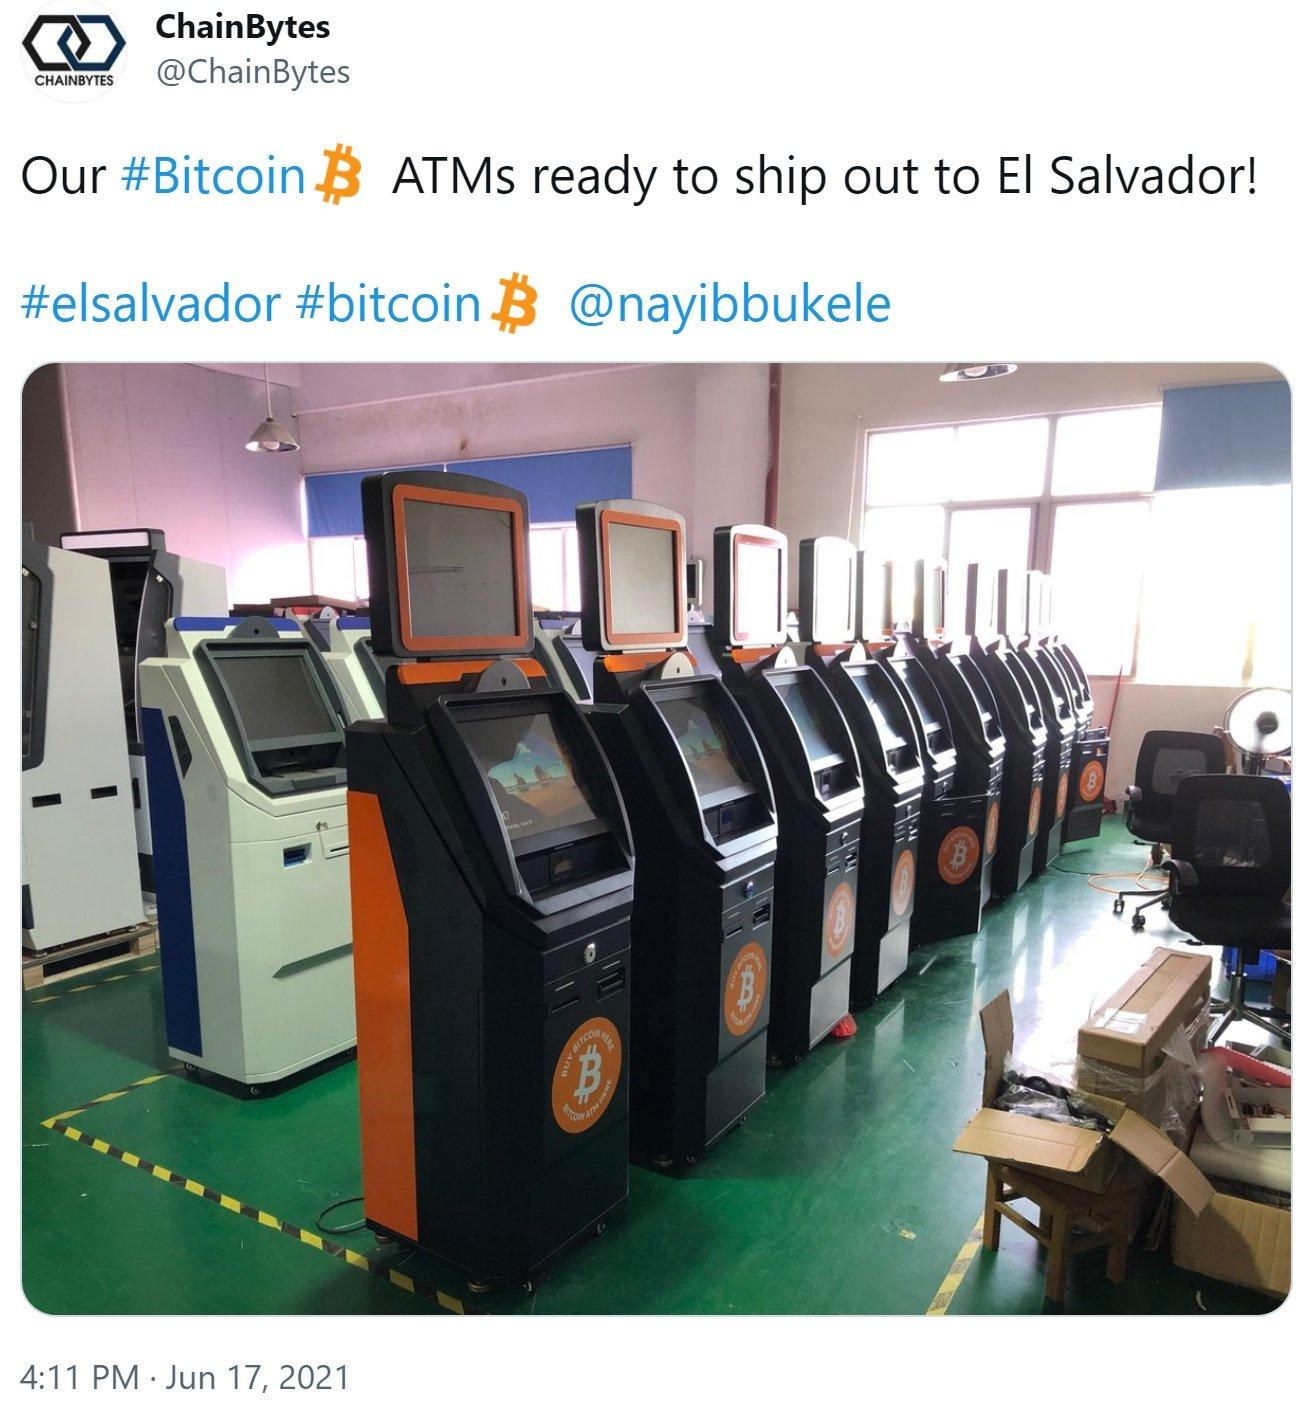 Chainbytes Bringing Bitcoin ATMs to El Salvador, Launching Manufacturing Hub